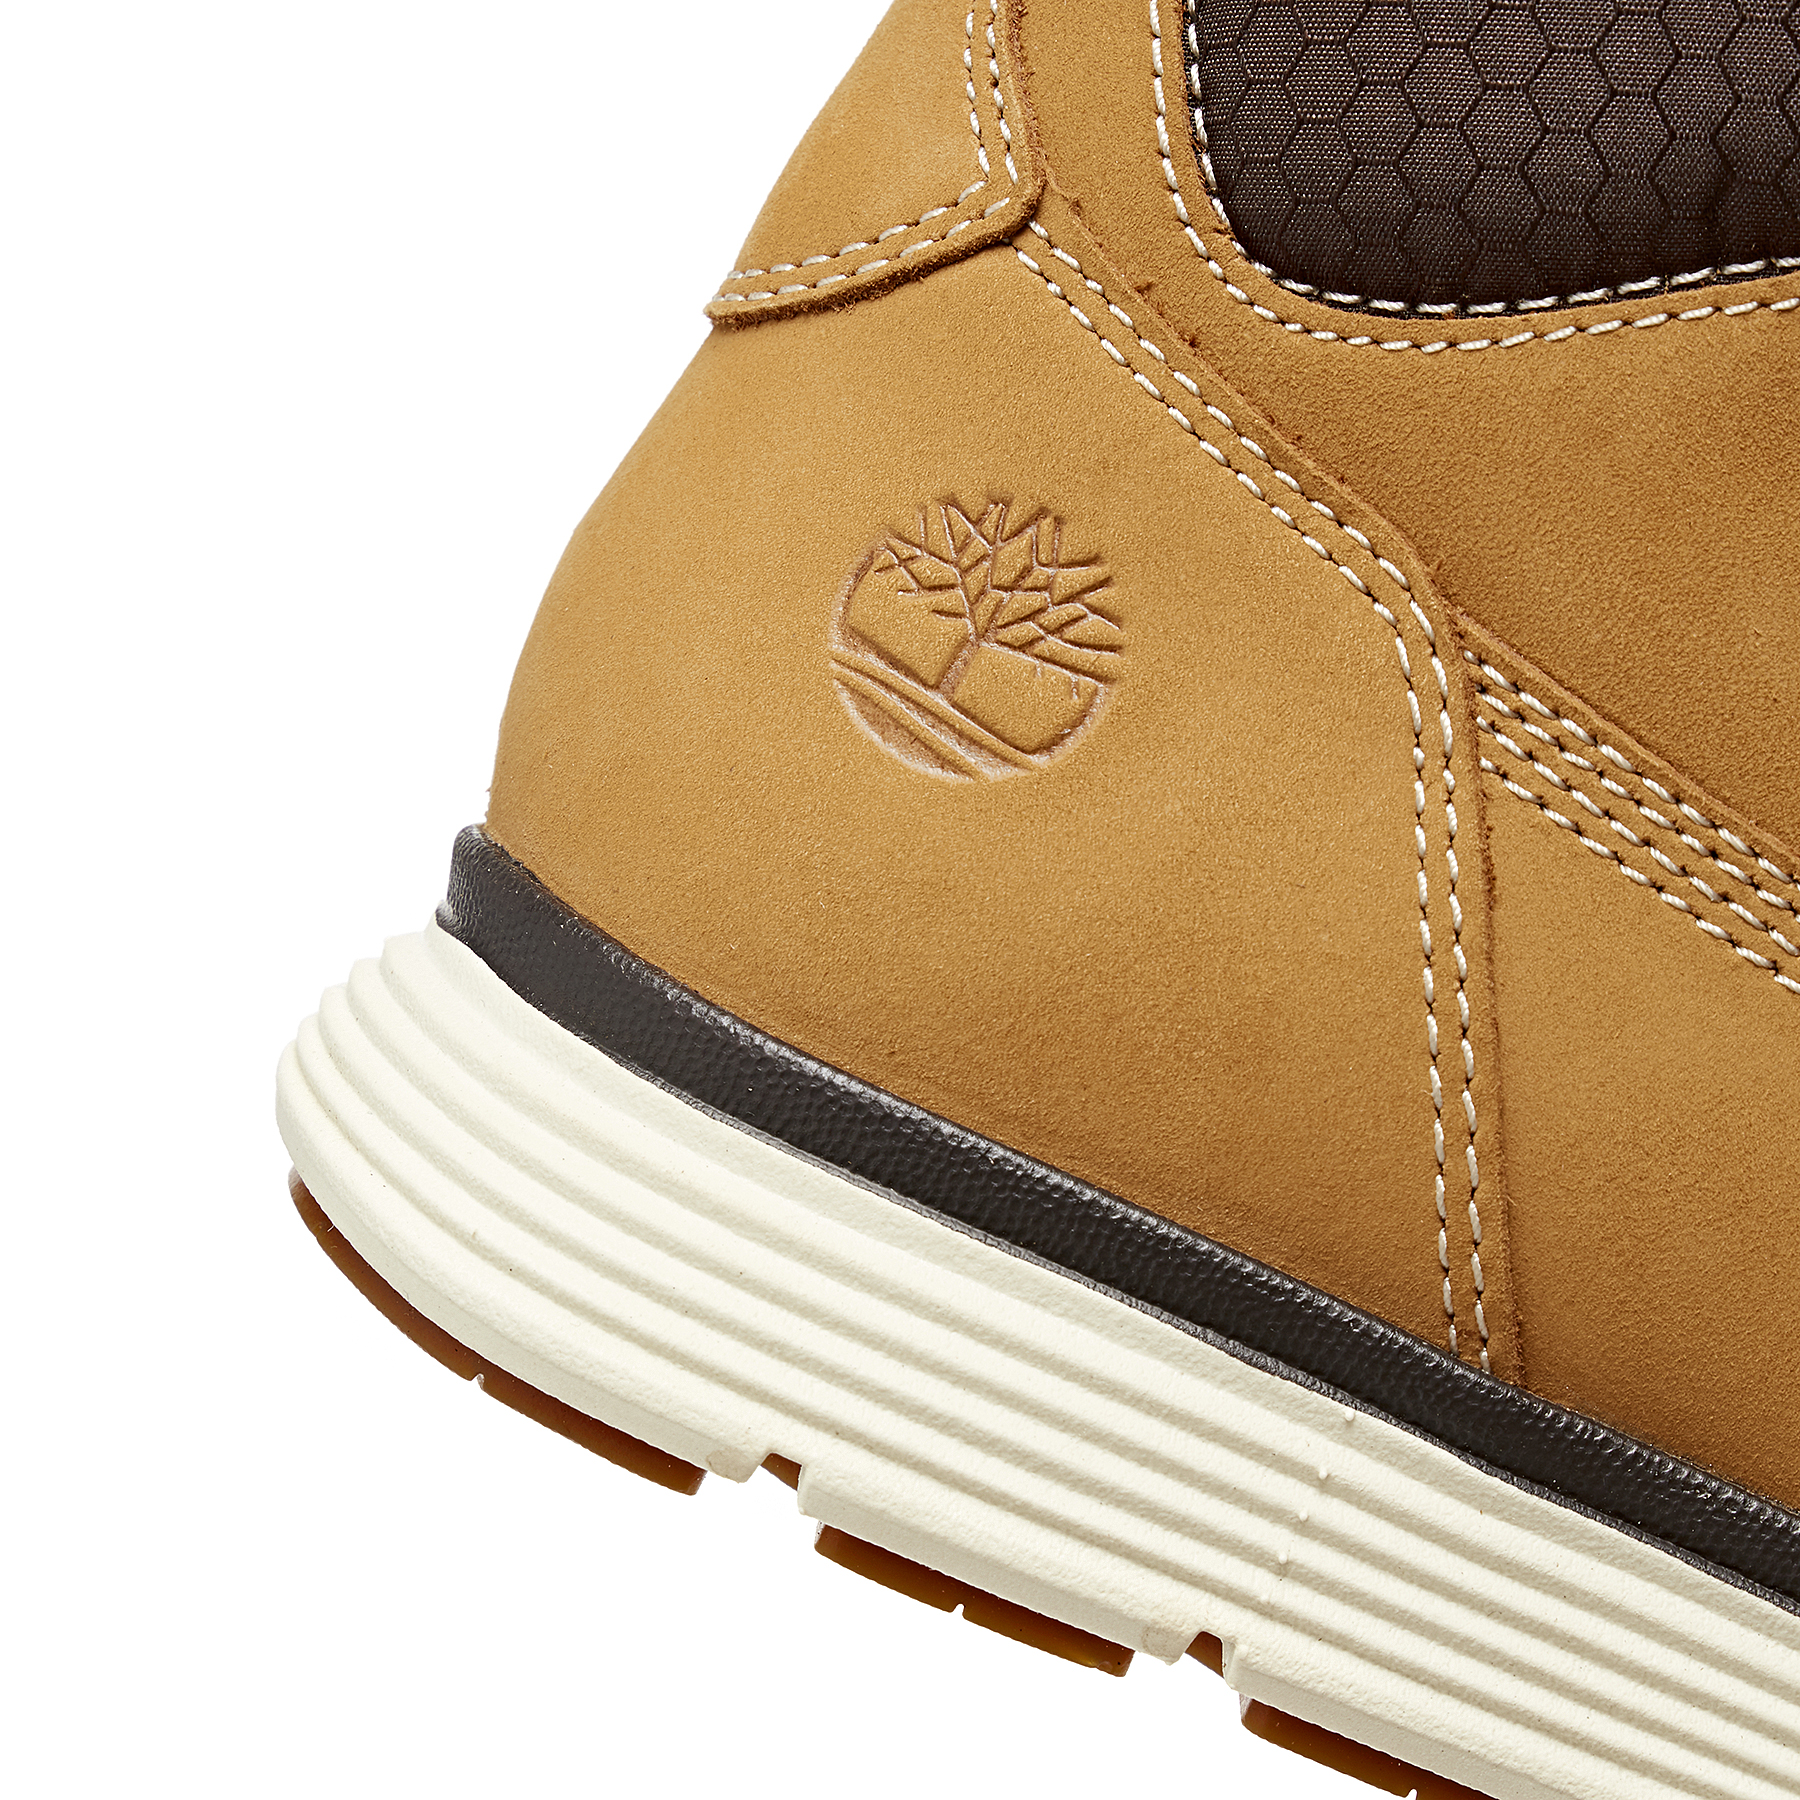 Timberland Killington Chukka Boots available from Blackleaf